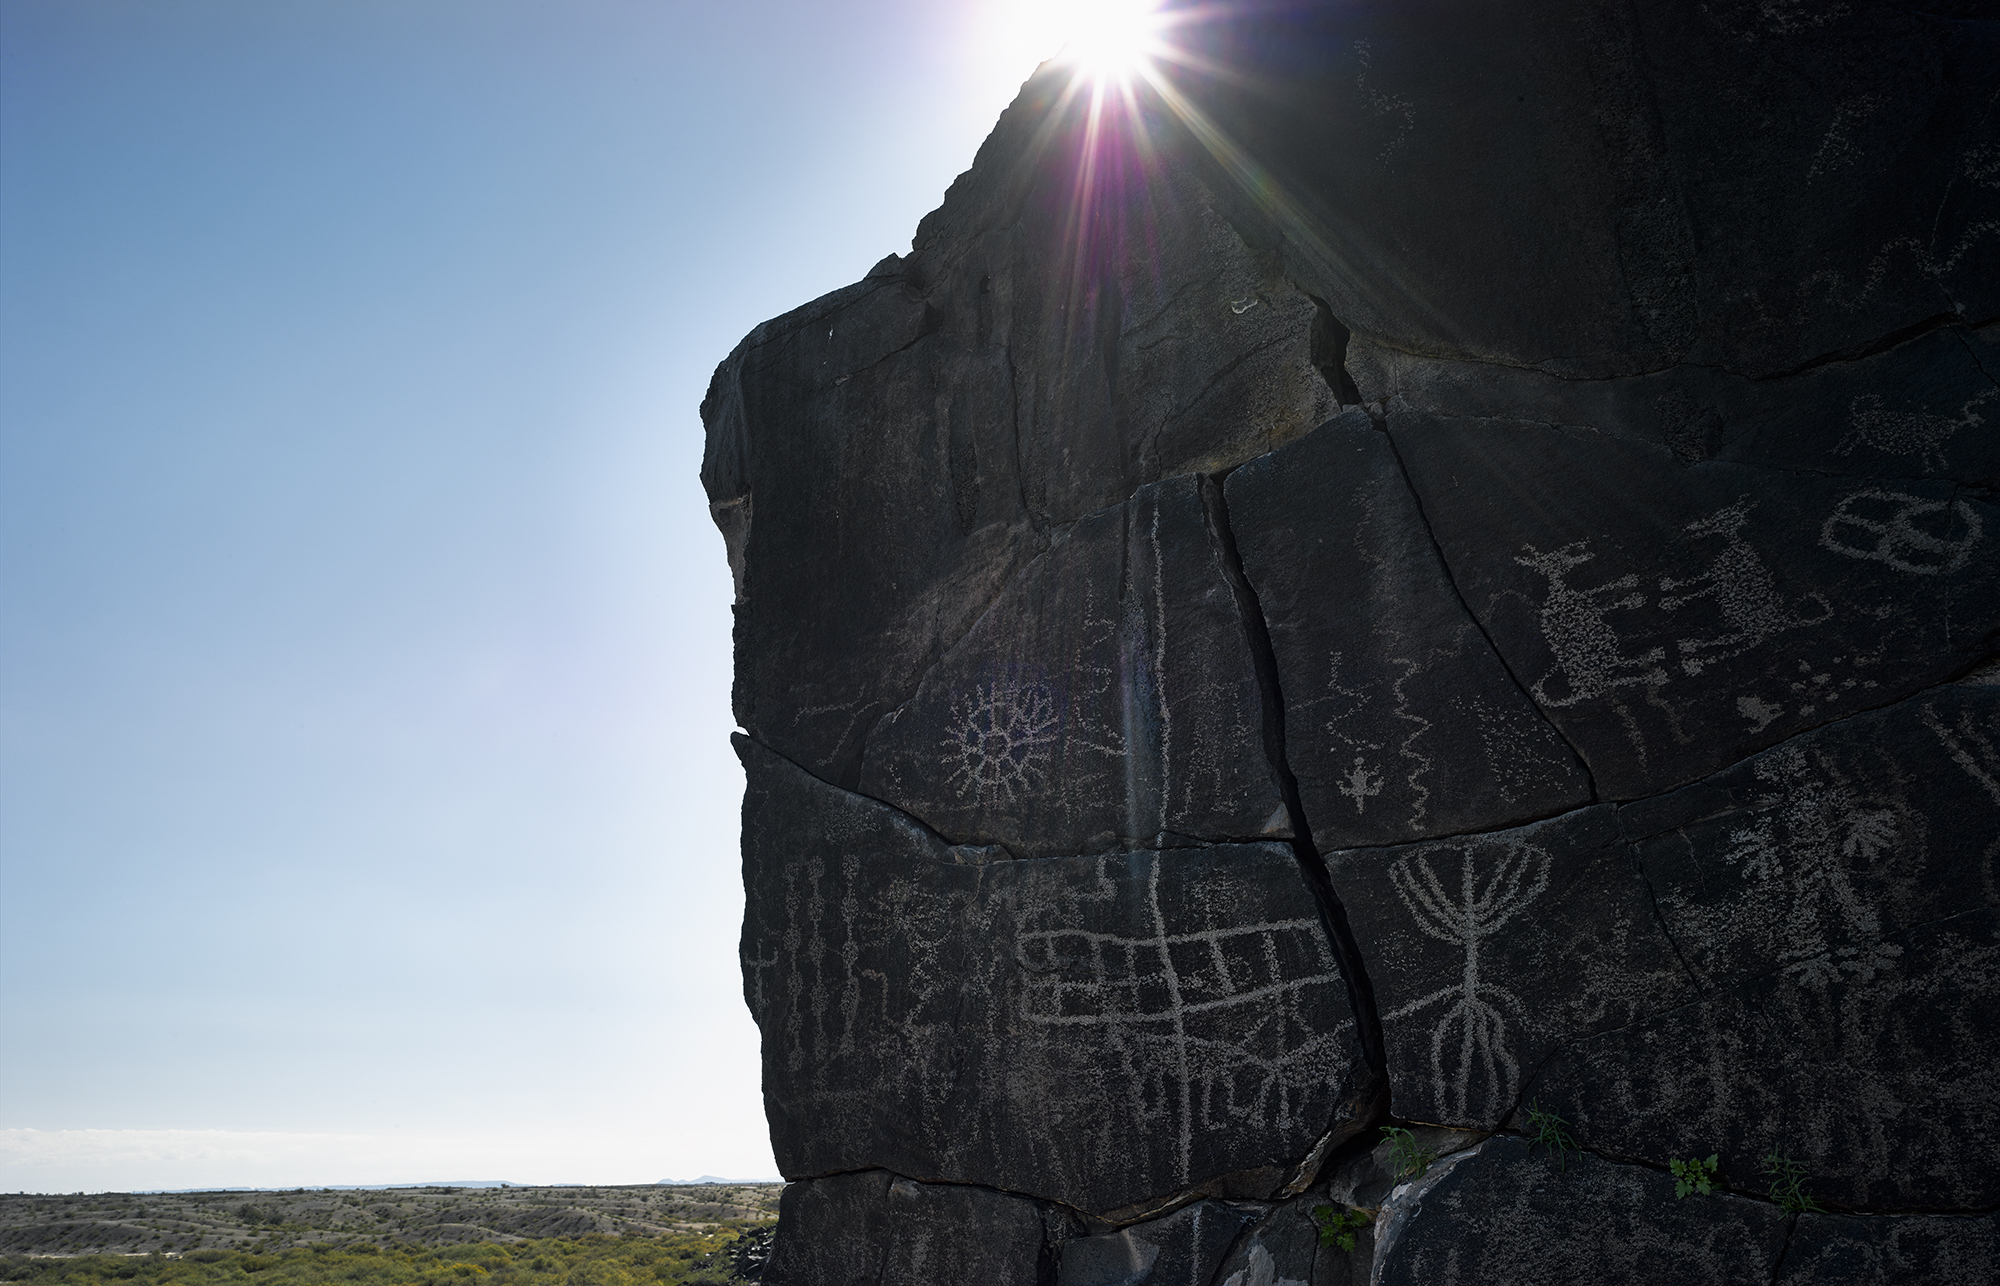 Petroglyphs near Sears Point, Gila River, 2014